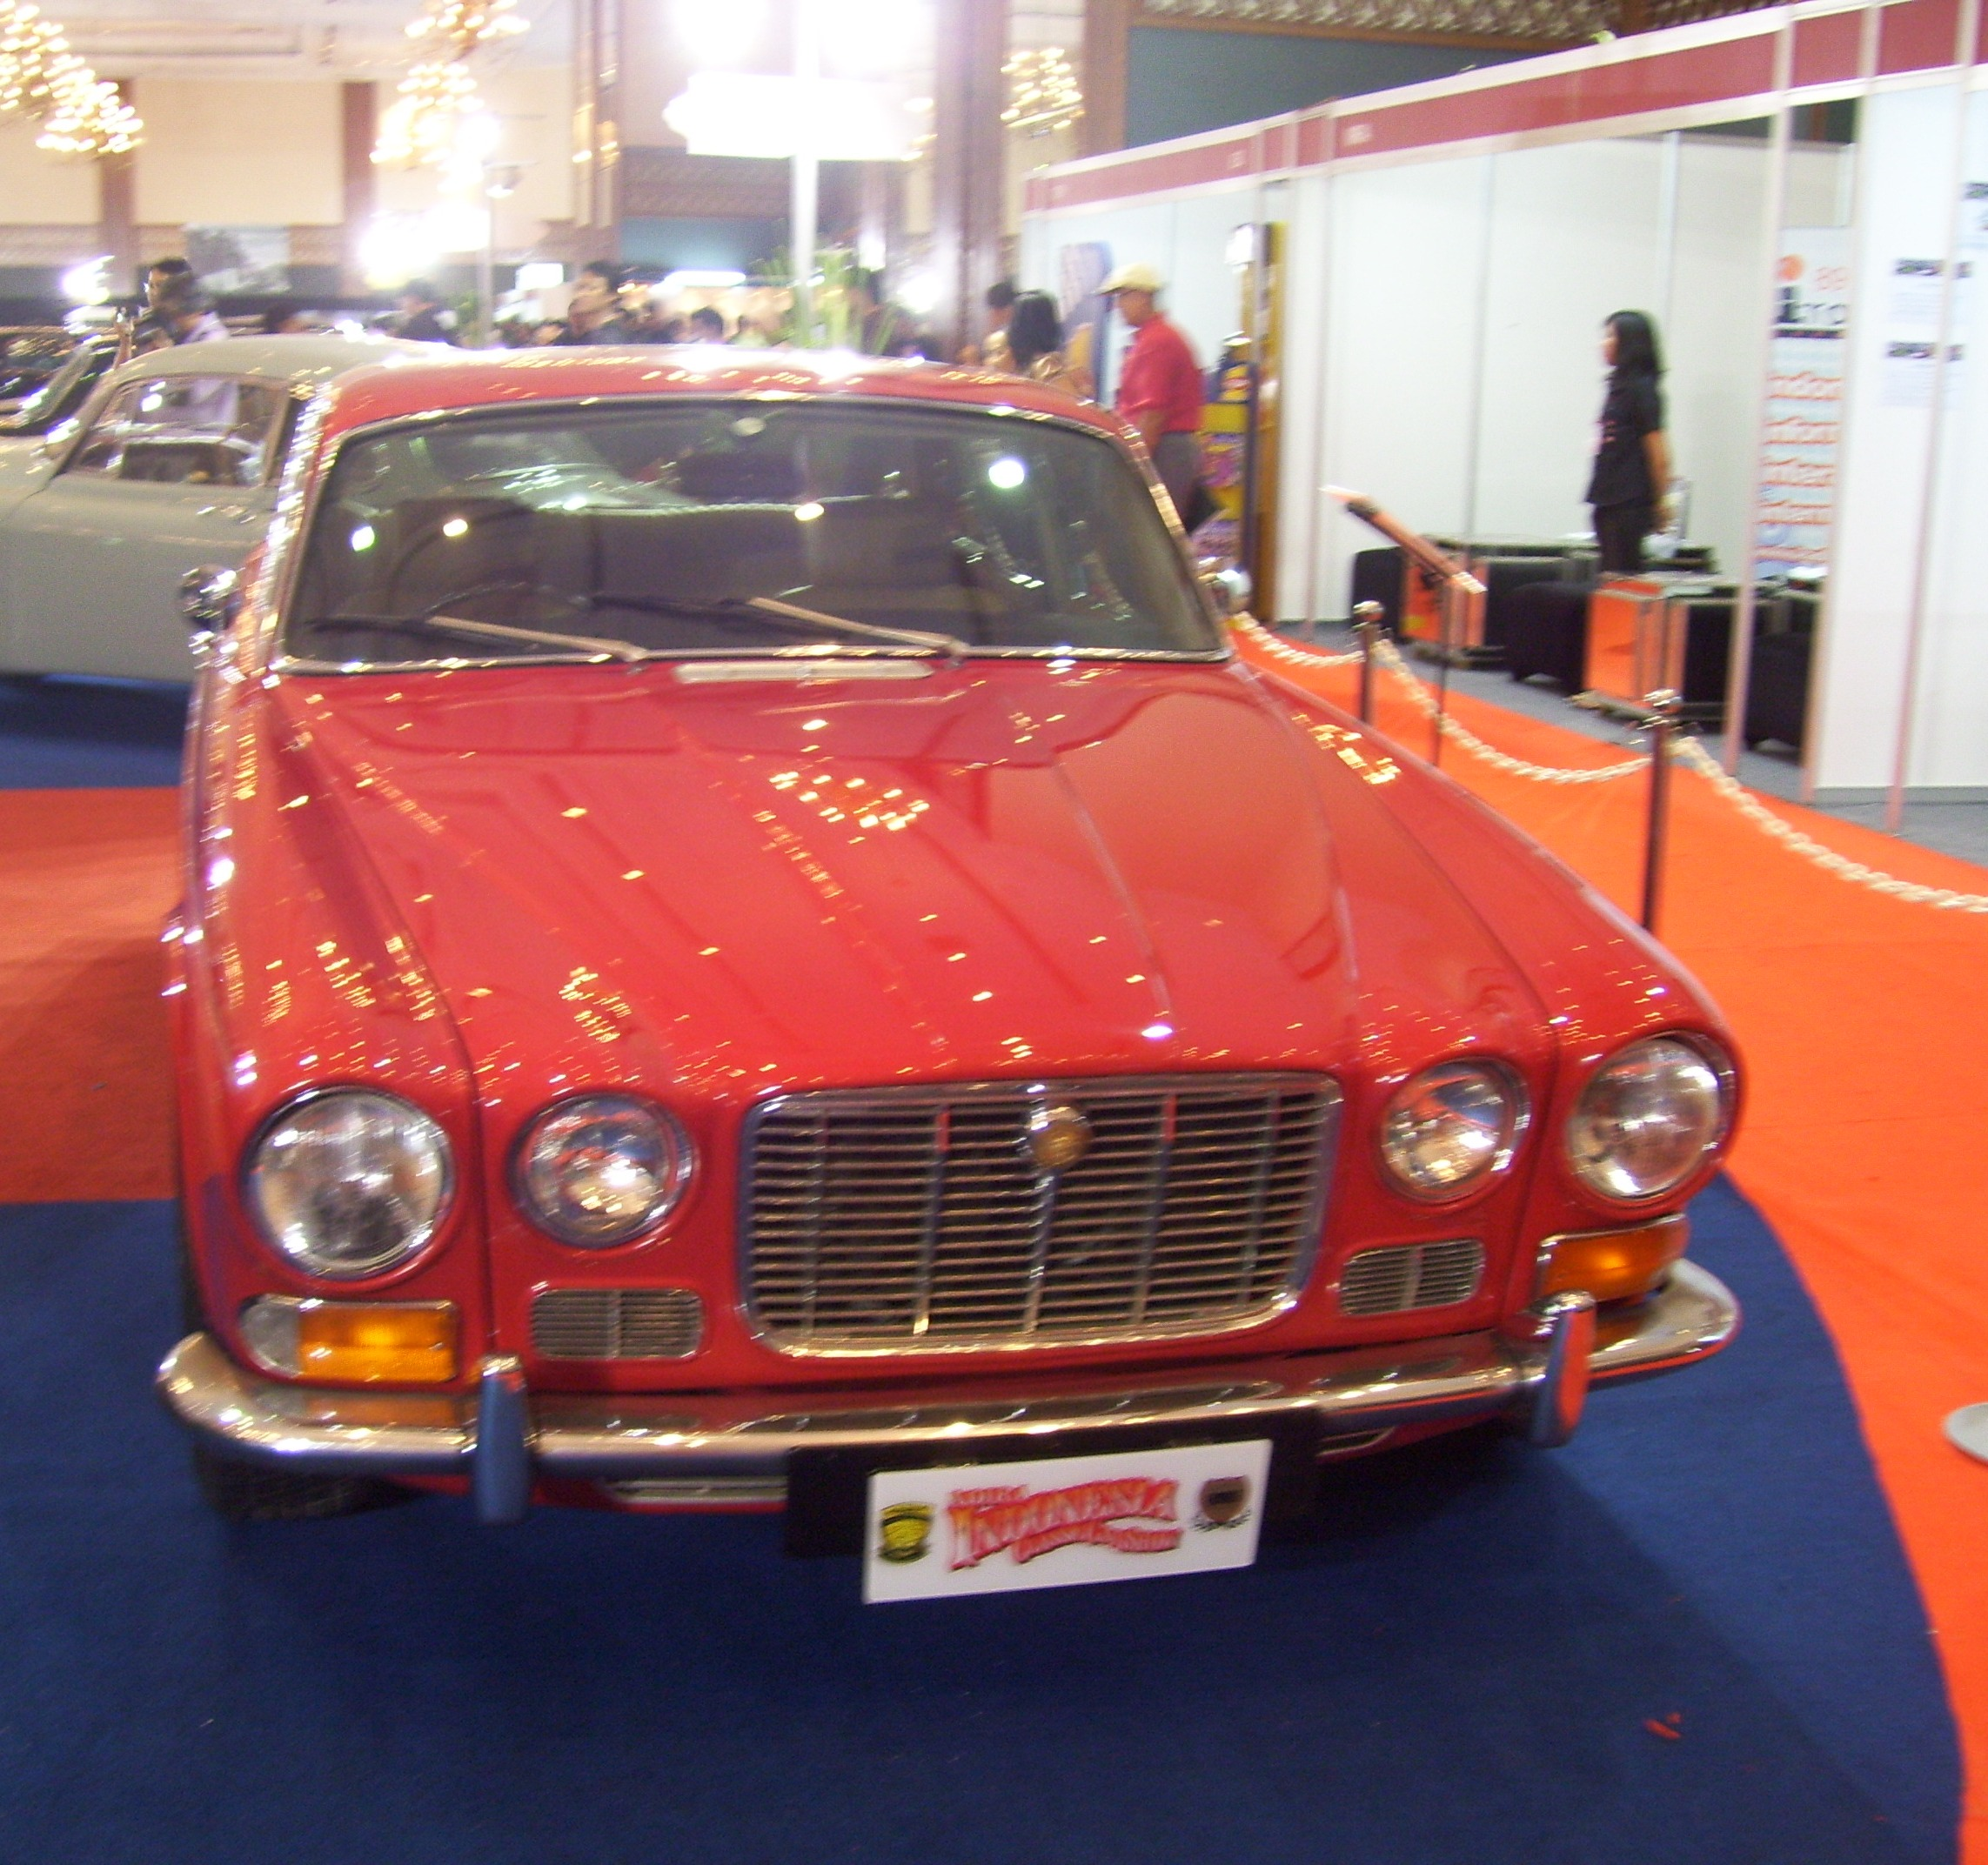 File:Jaguar XJ6 Series 1 - 1971 front.jpg - Wikimedia Commons